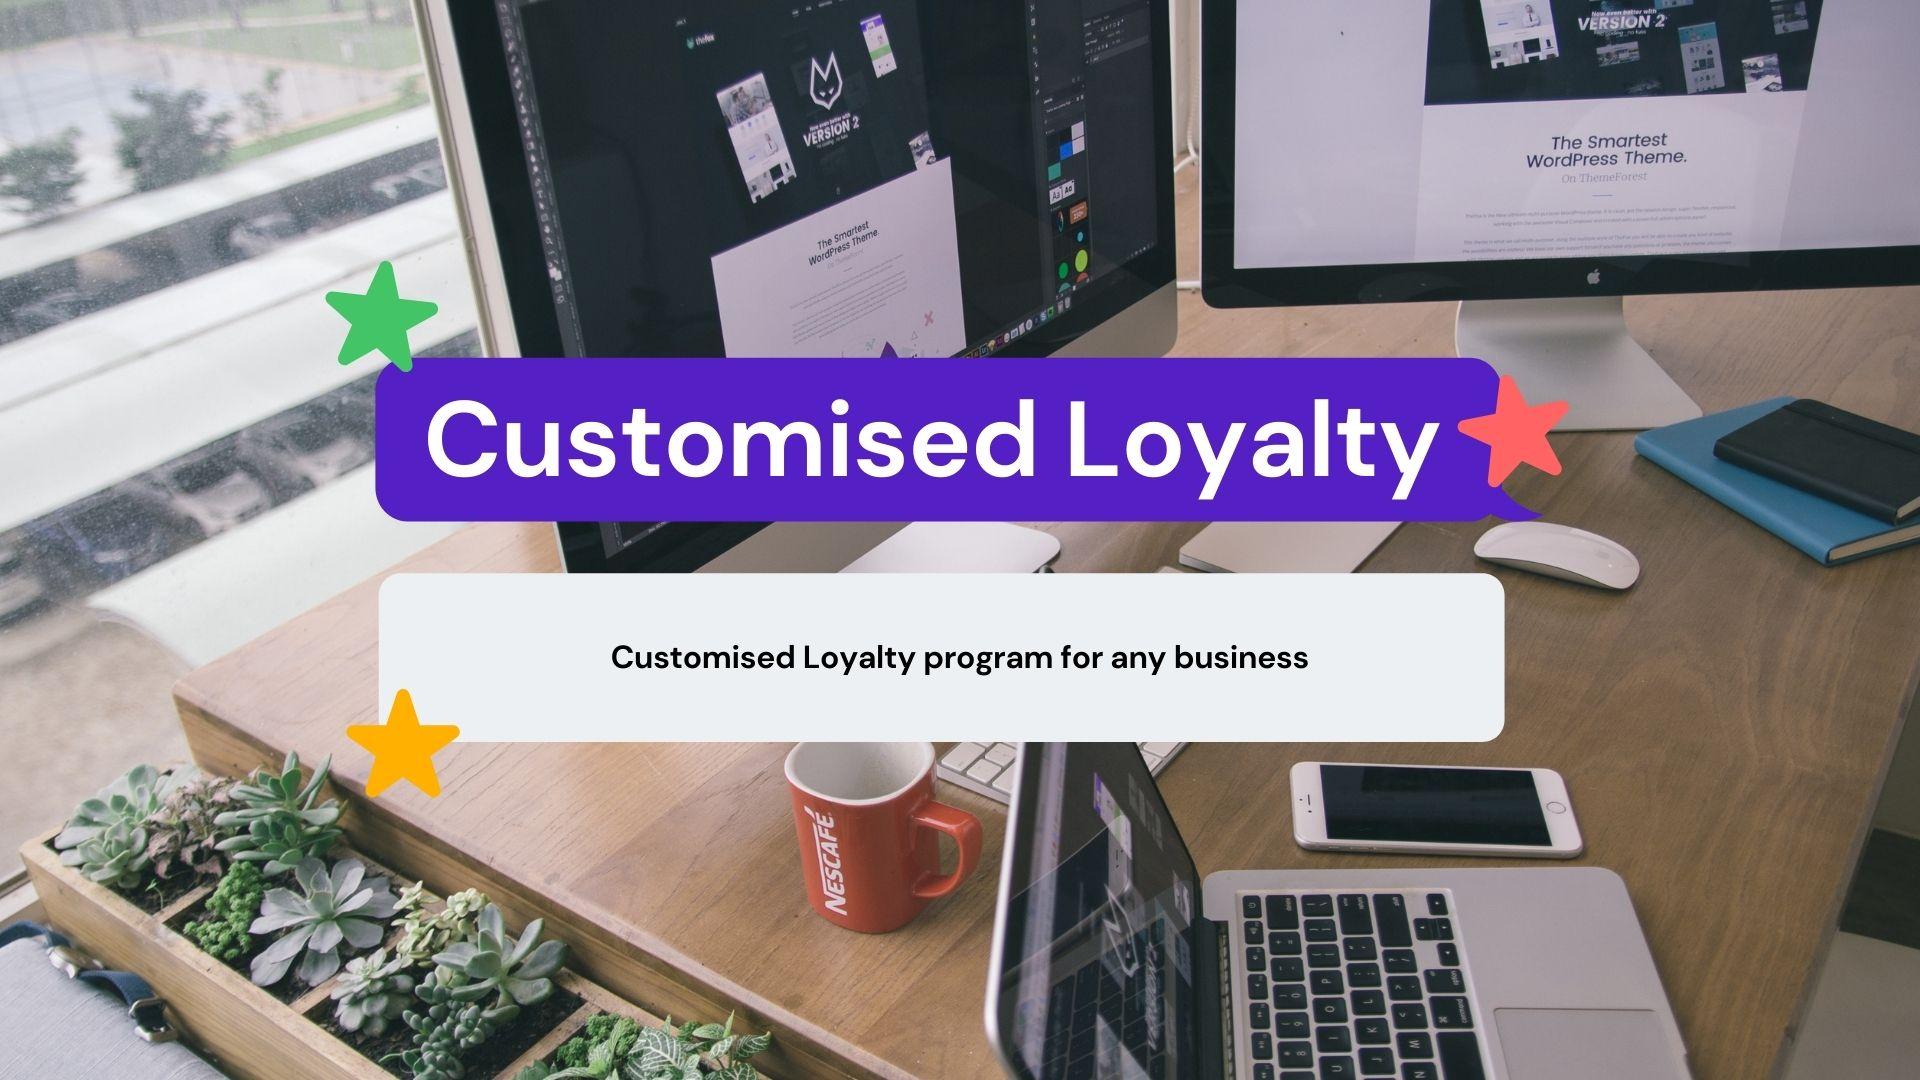 Customised Loyalty program by CXBOX